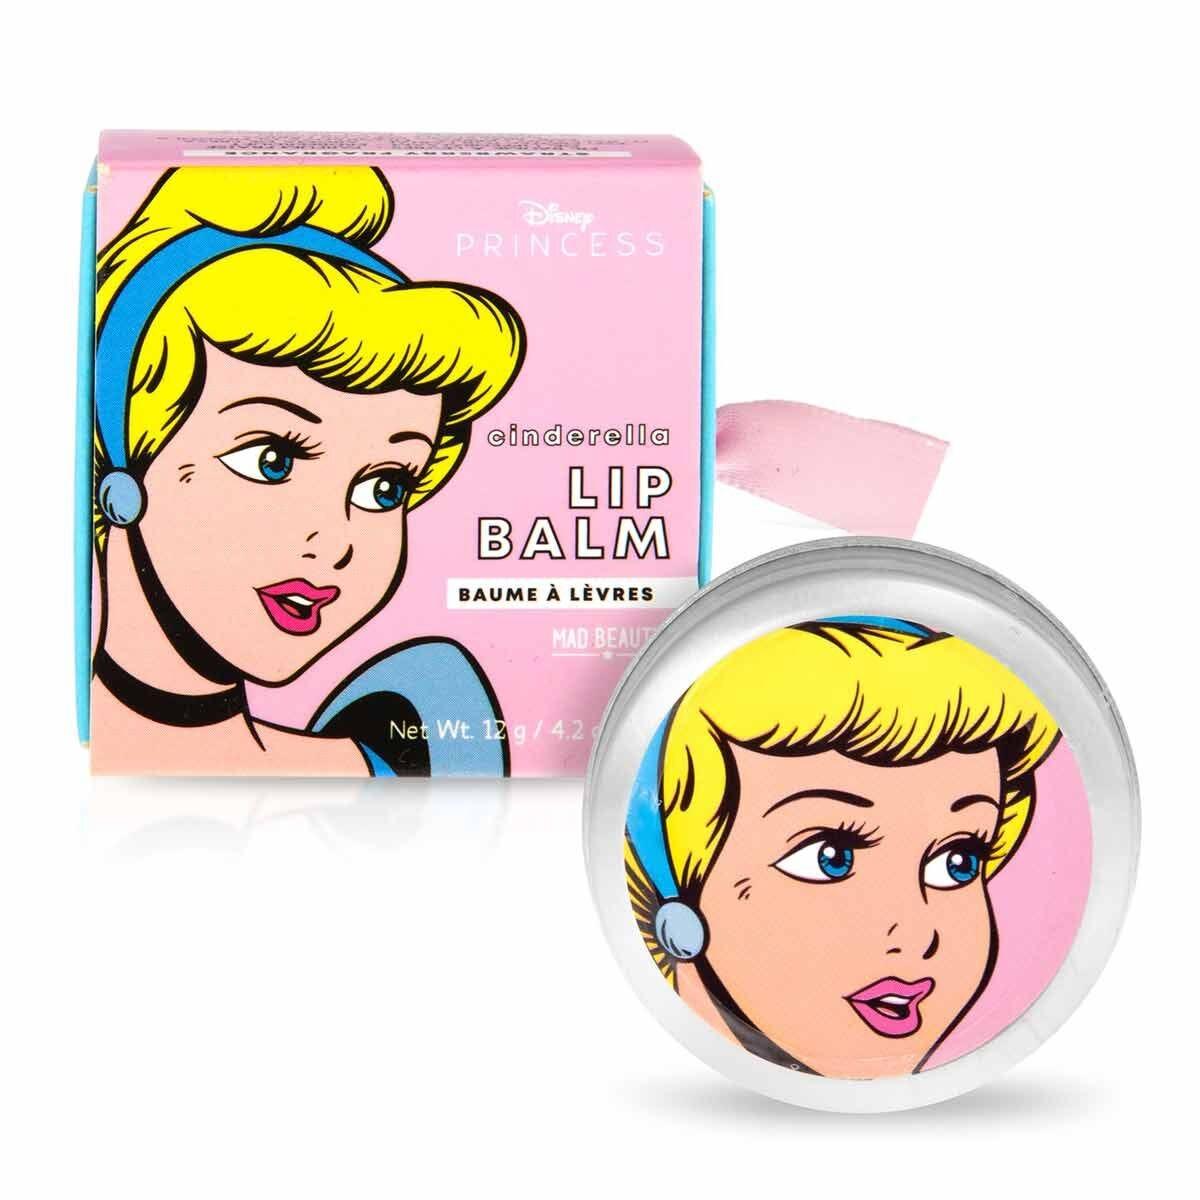 Disney Princess Lip Balm Cinderella